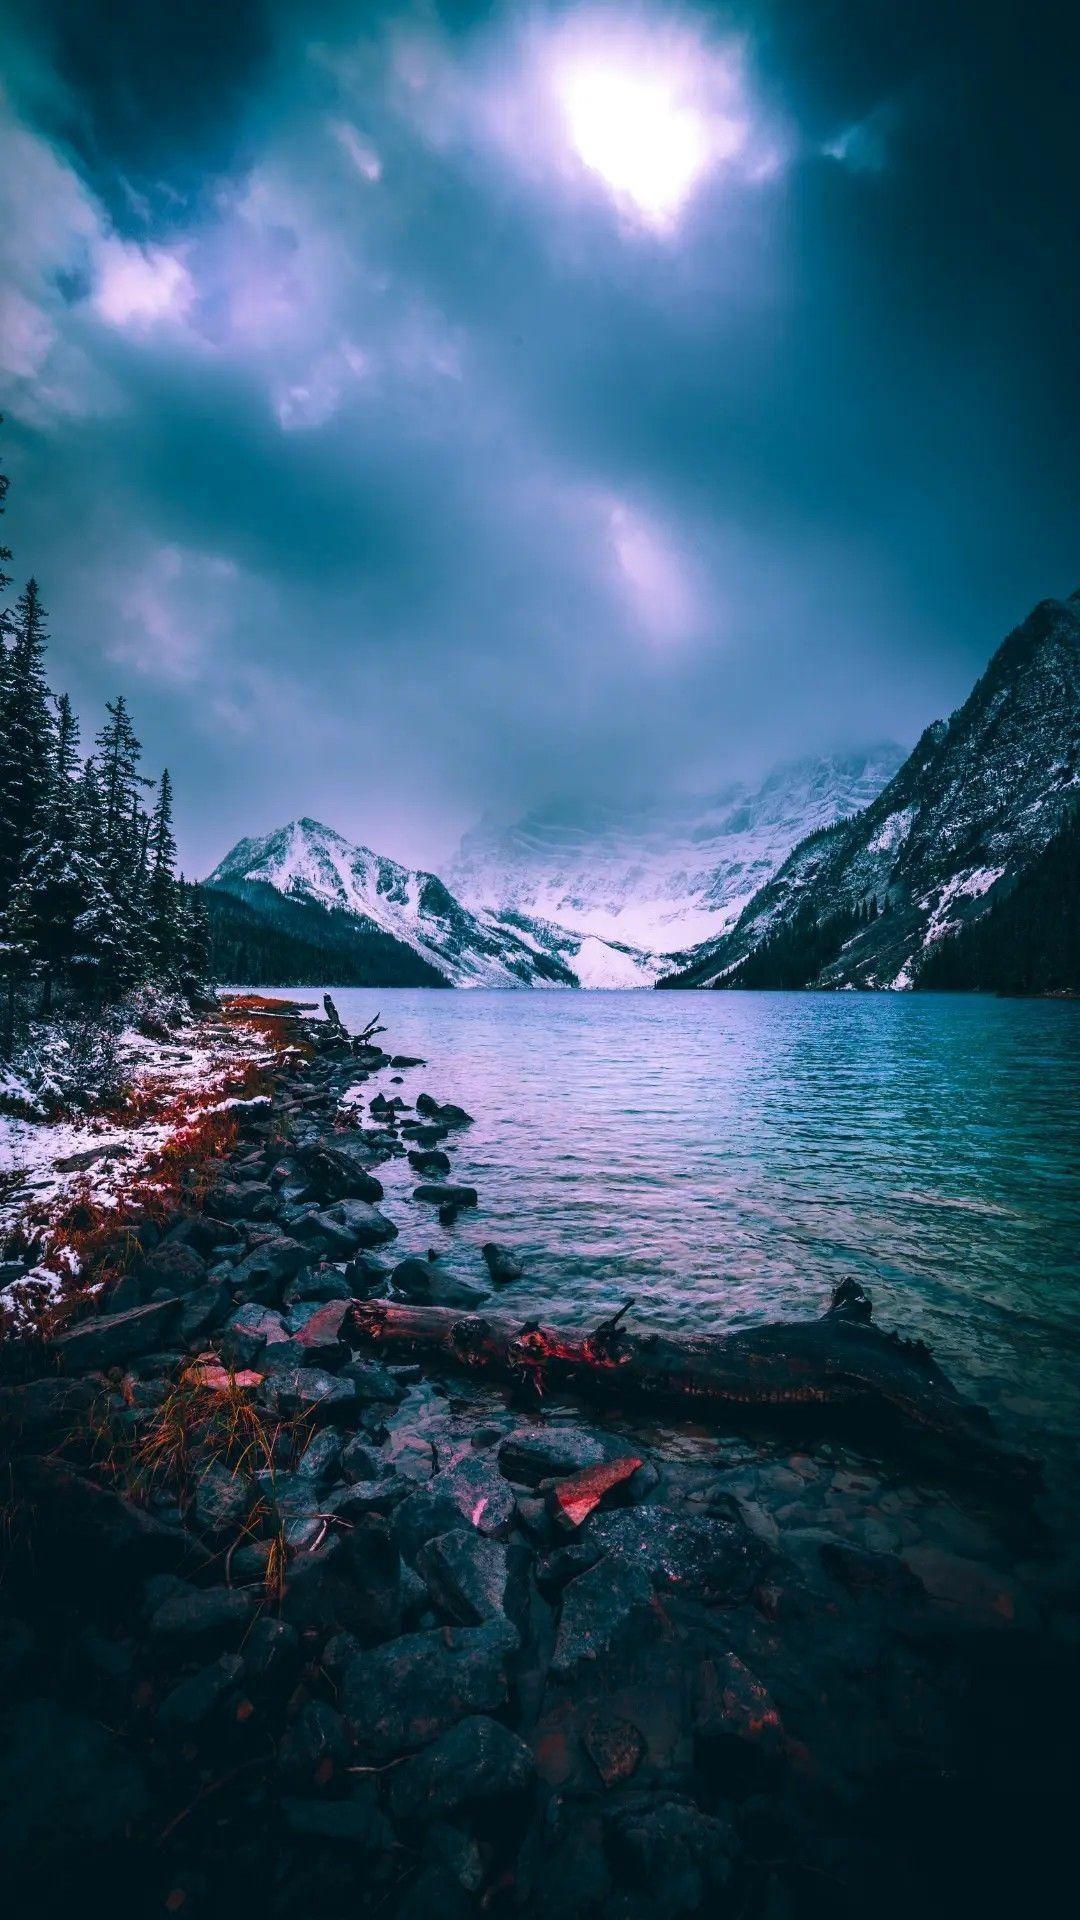 Unbelievable Unseen Nature Beauty Pics